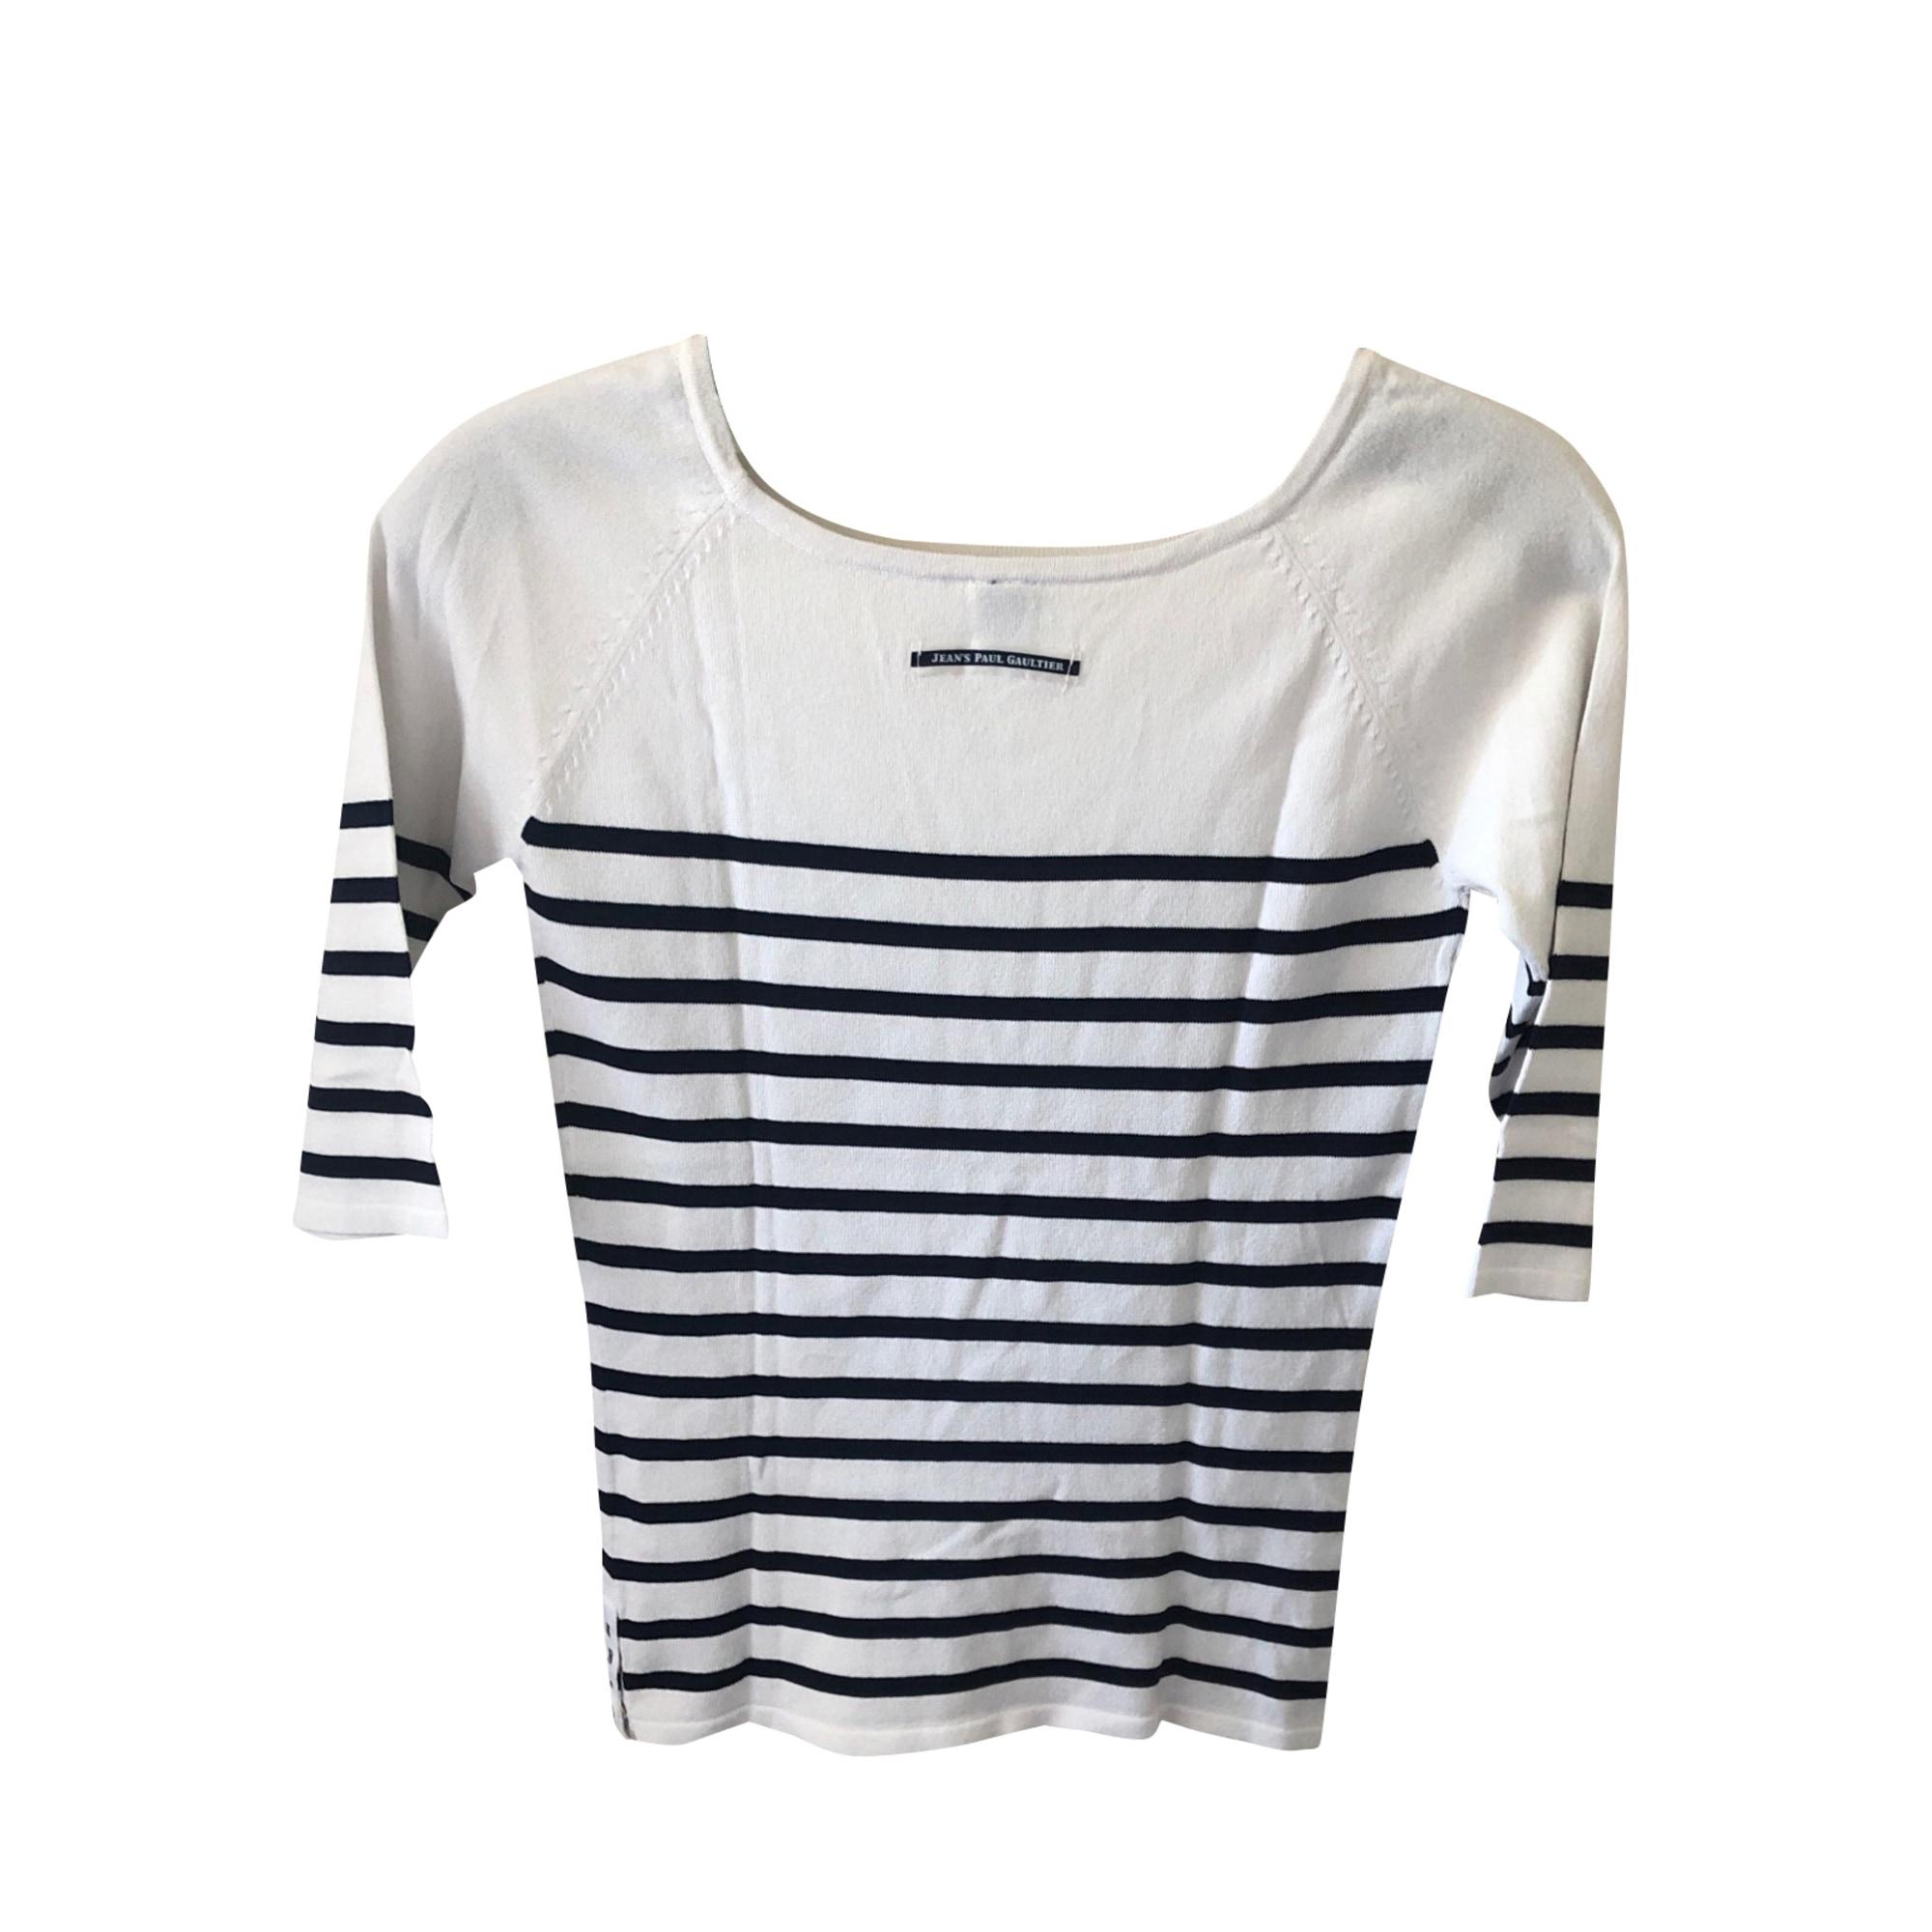 Top, tee-shirt JEAN PAUL GAULTIER Blanc rayé bleu